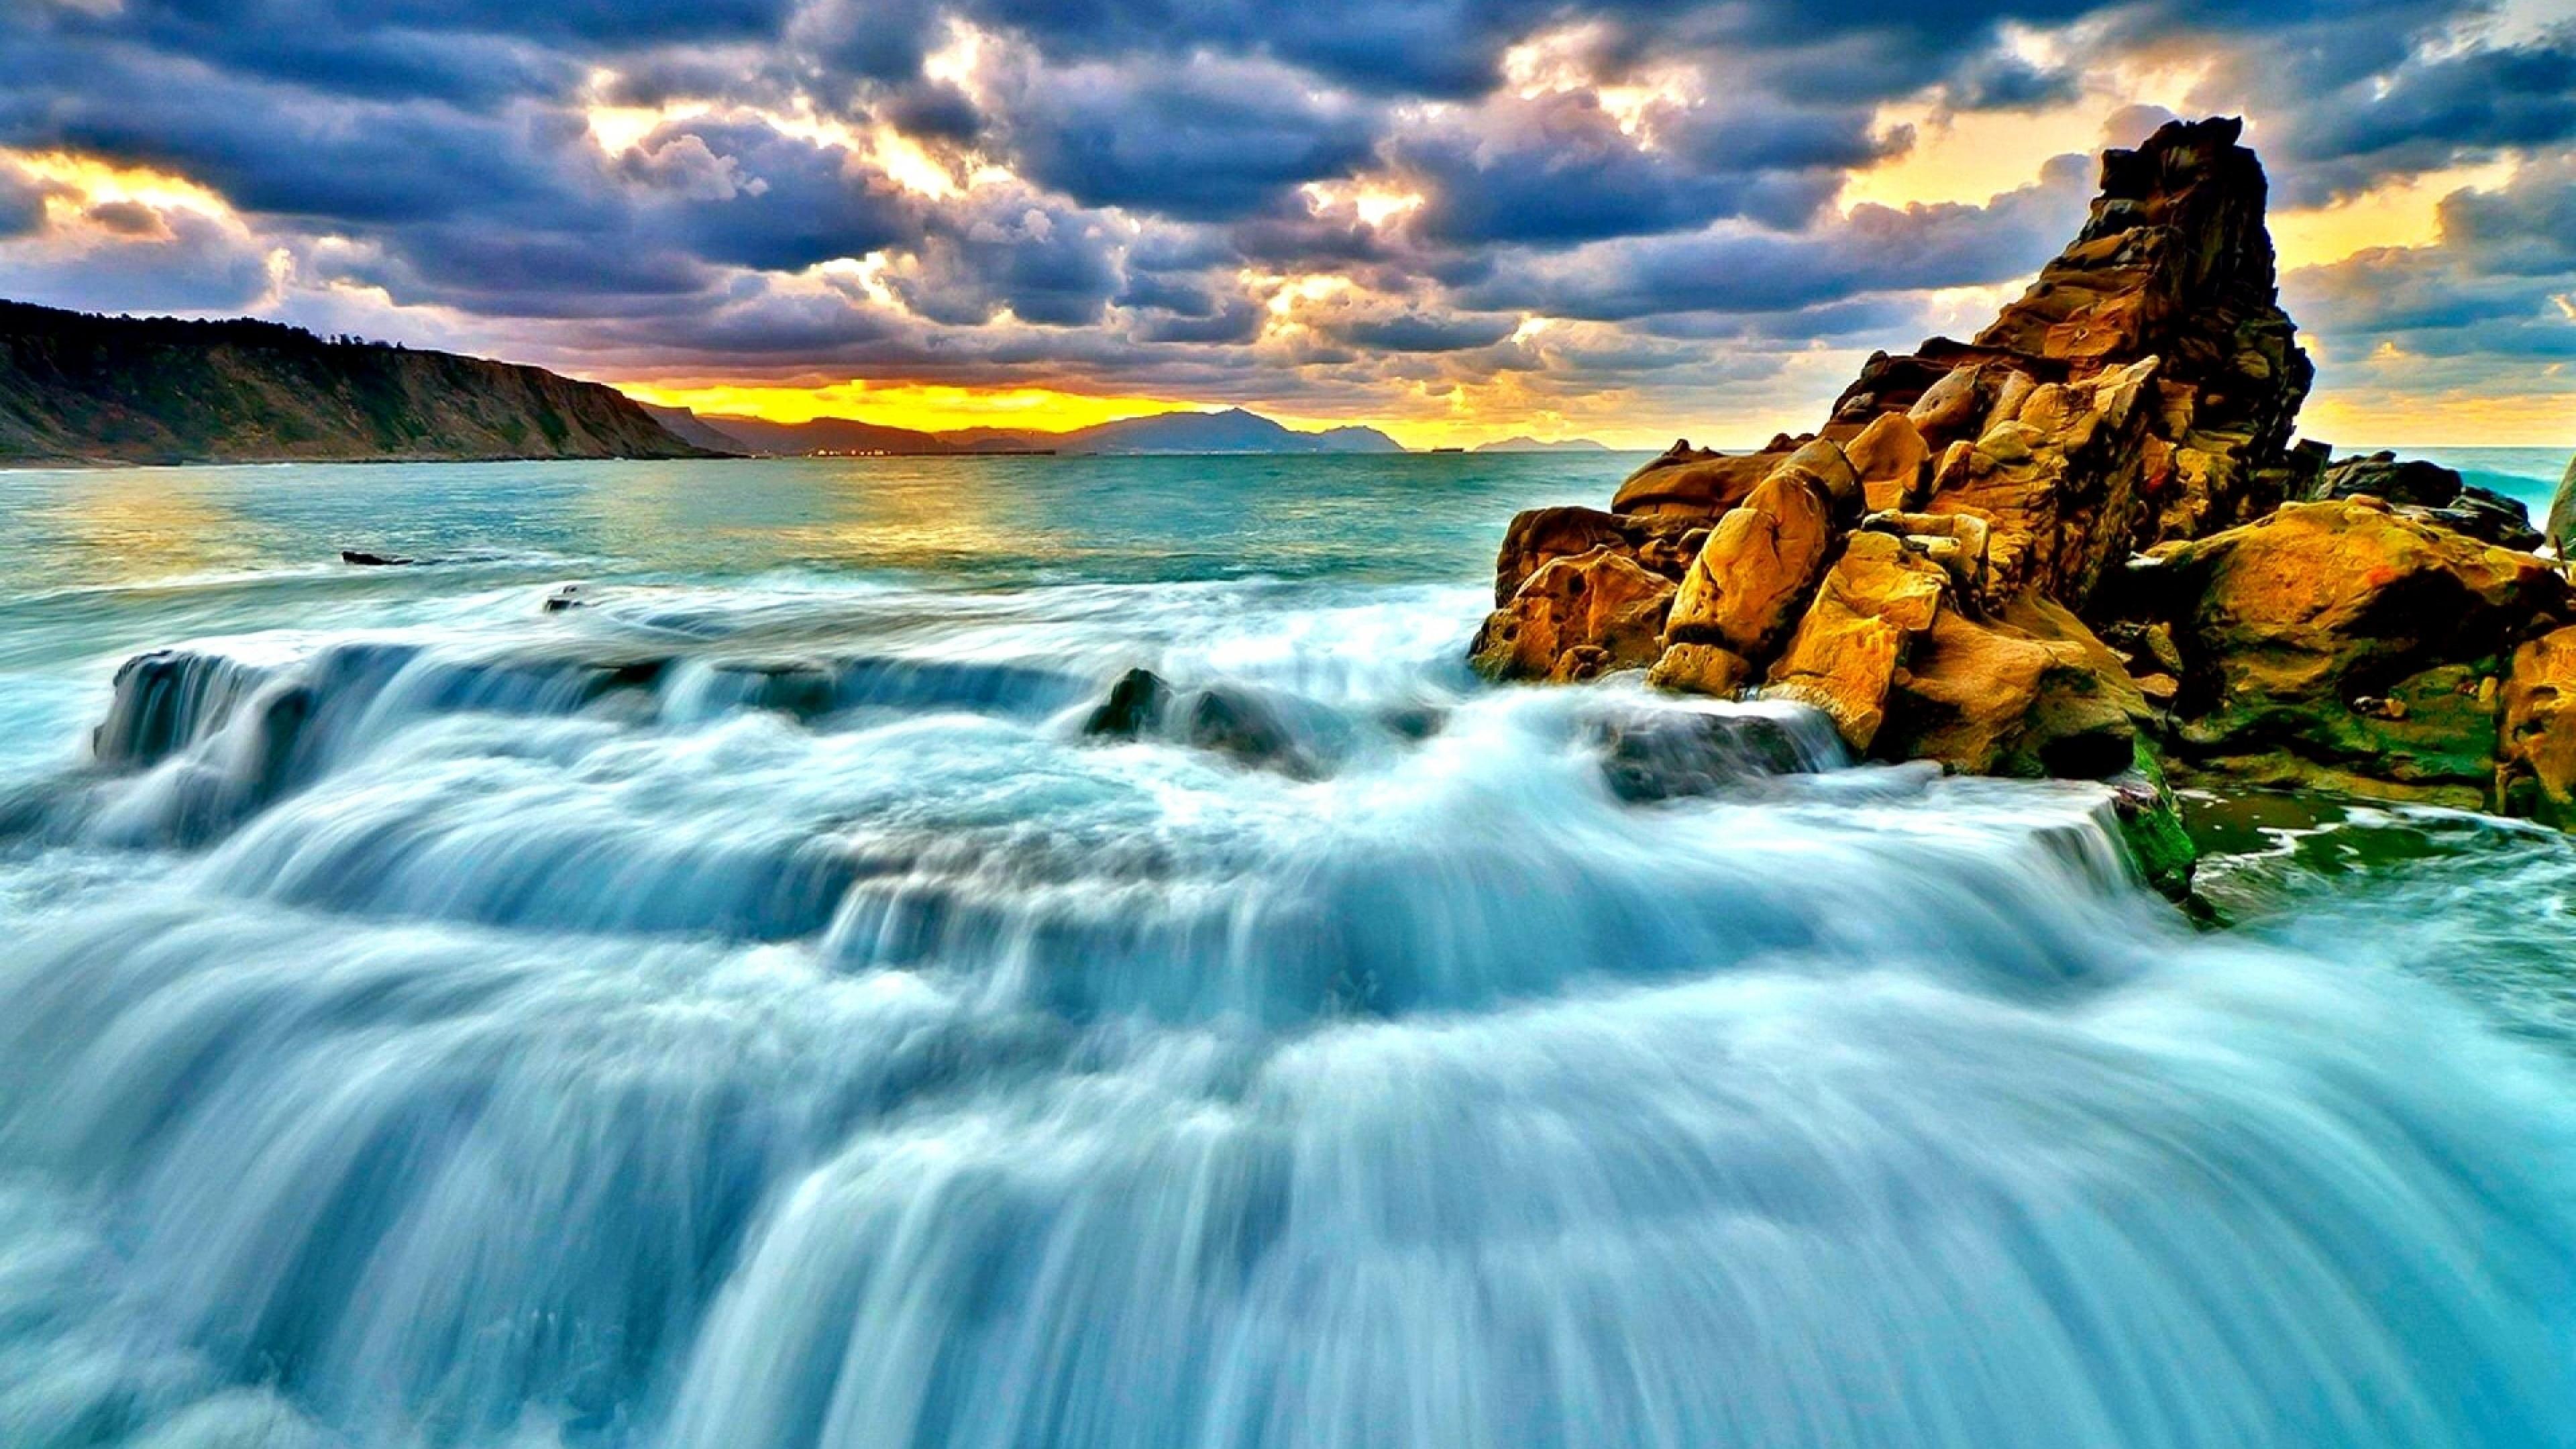 Water Fall Wallpaper Hd For Desktop Free Download Waterfall Wallpaper High Quality Pixelstalk Net